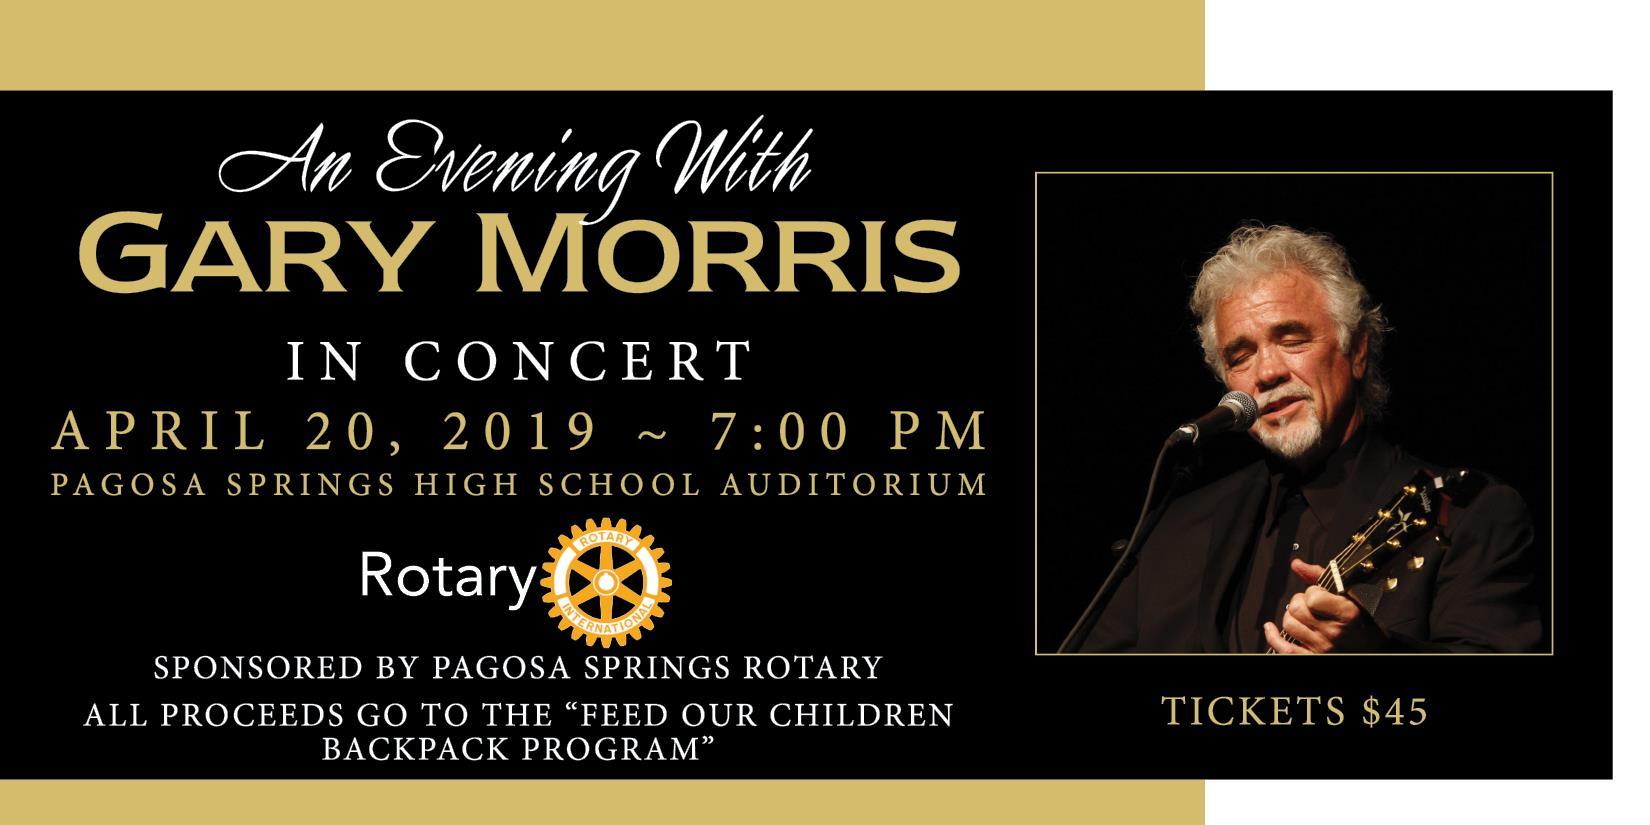 Stories | Rotary Club of Pagosa Springs